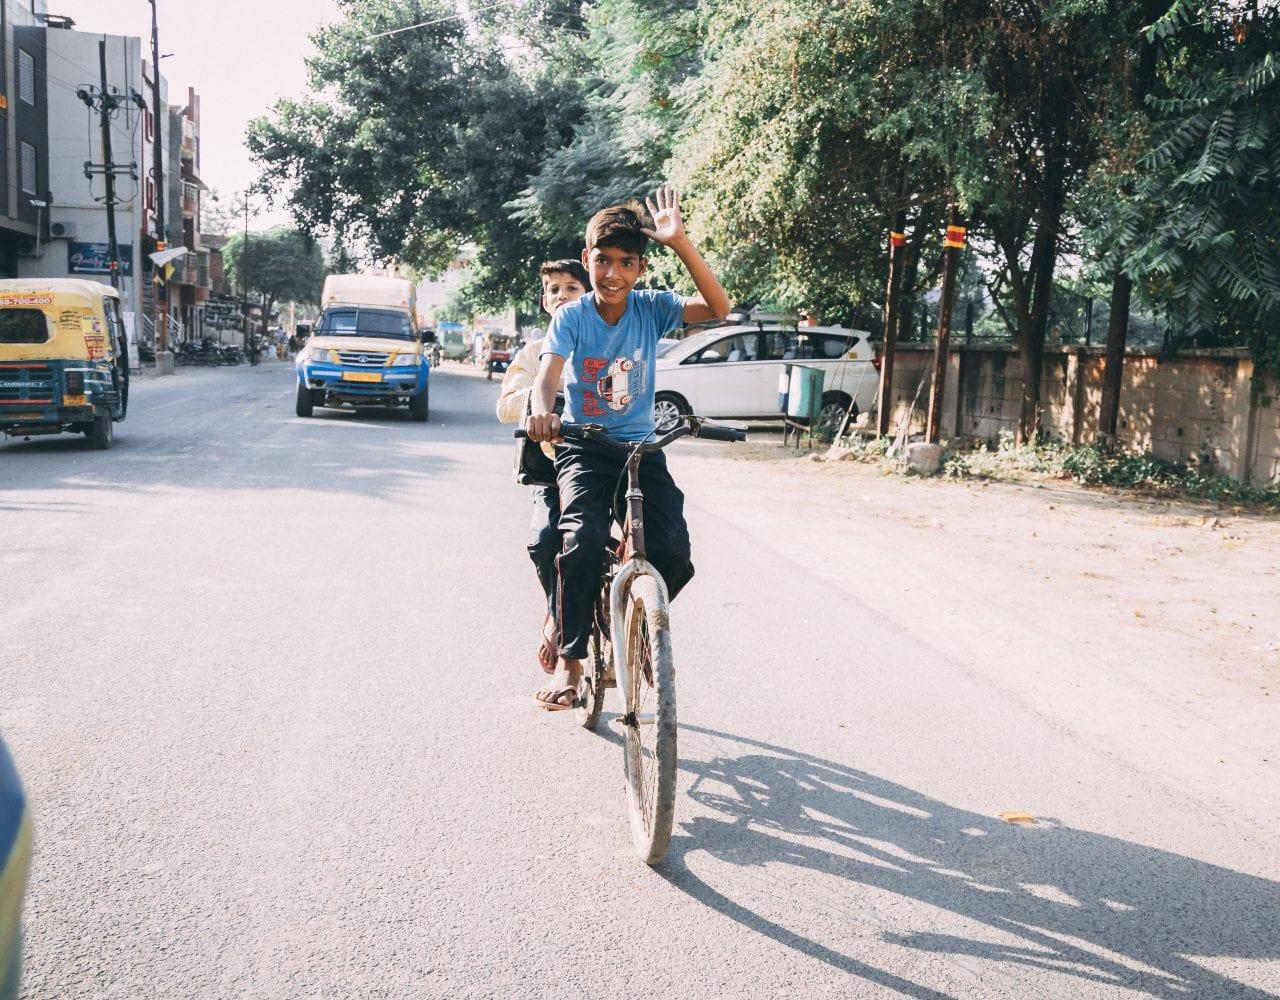 Kids on a bike in Delhi